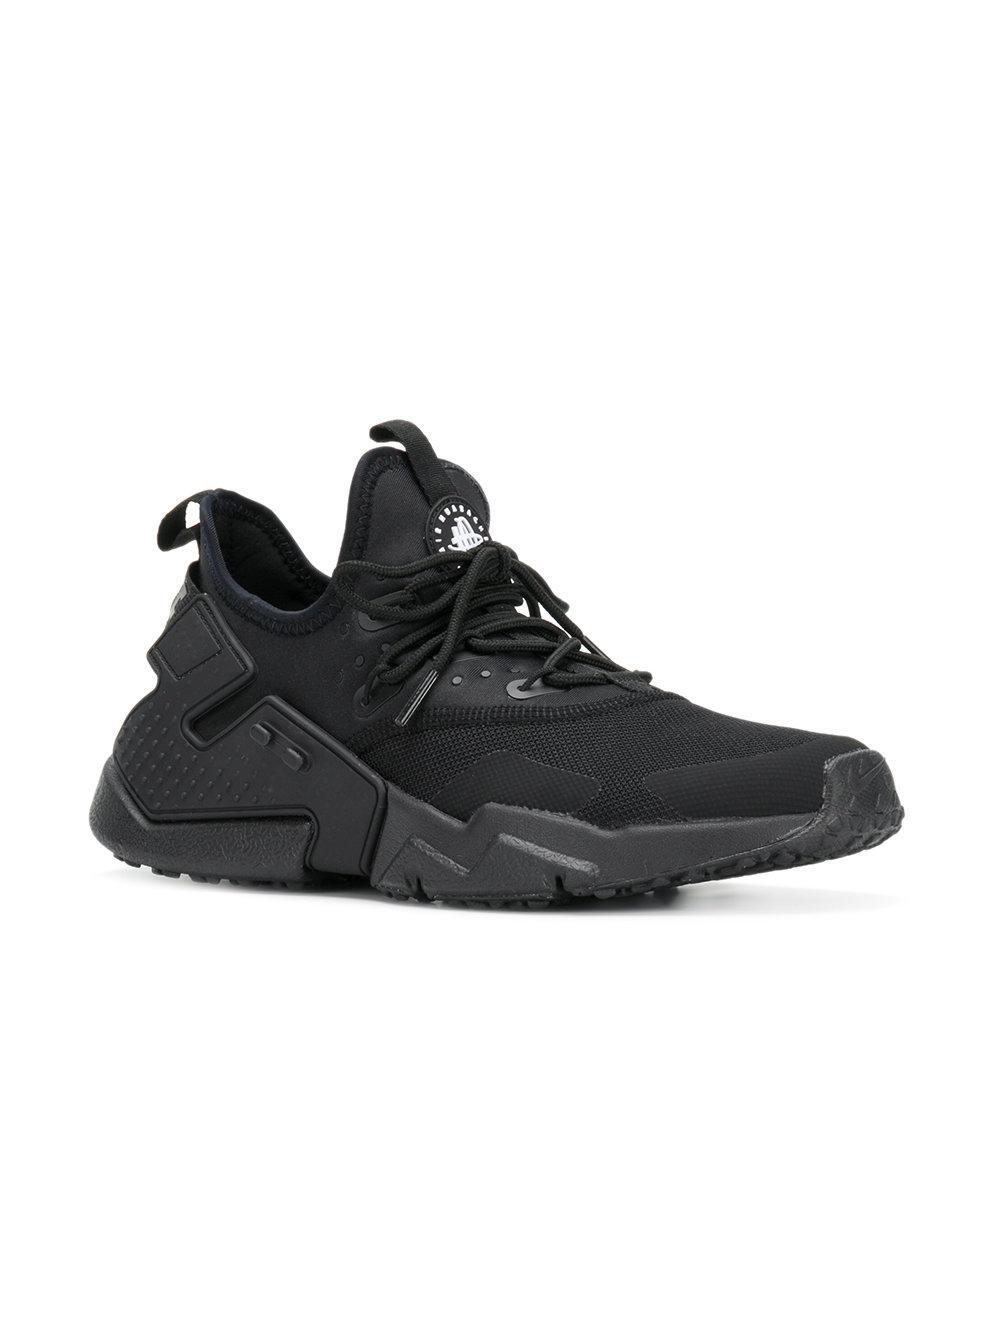 29b4f1f56b5 Lyst - Nike Air Huarache Drift Sneakers in Black for Men